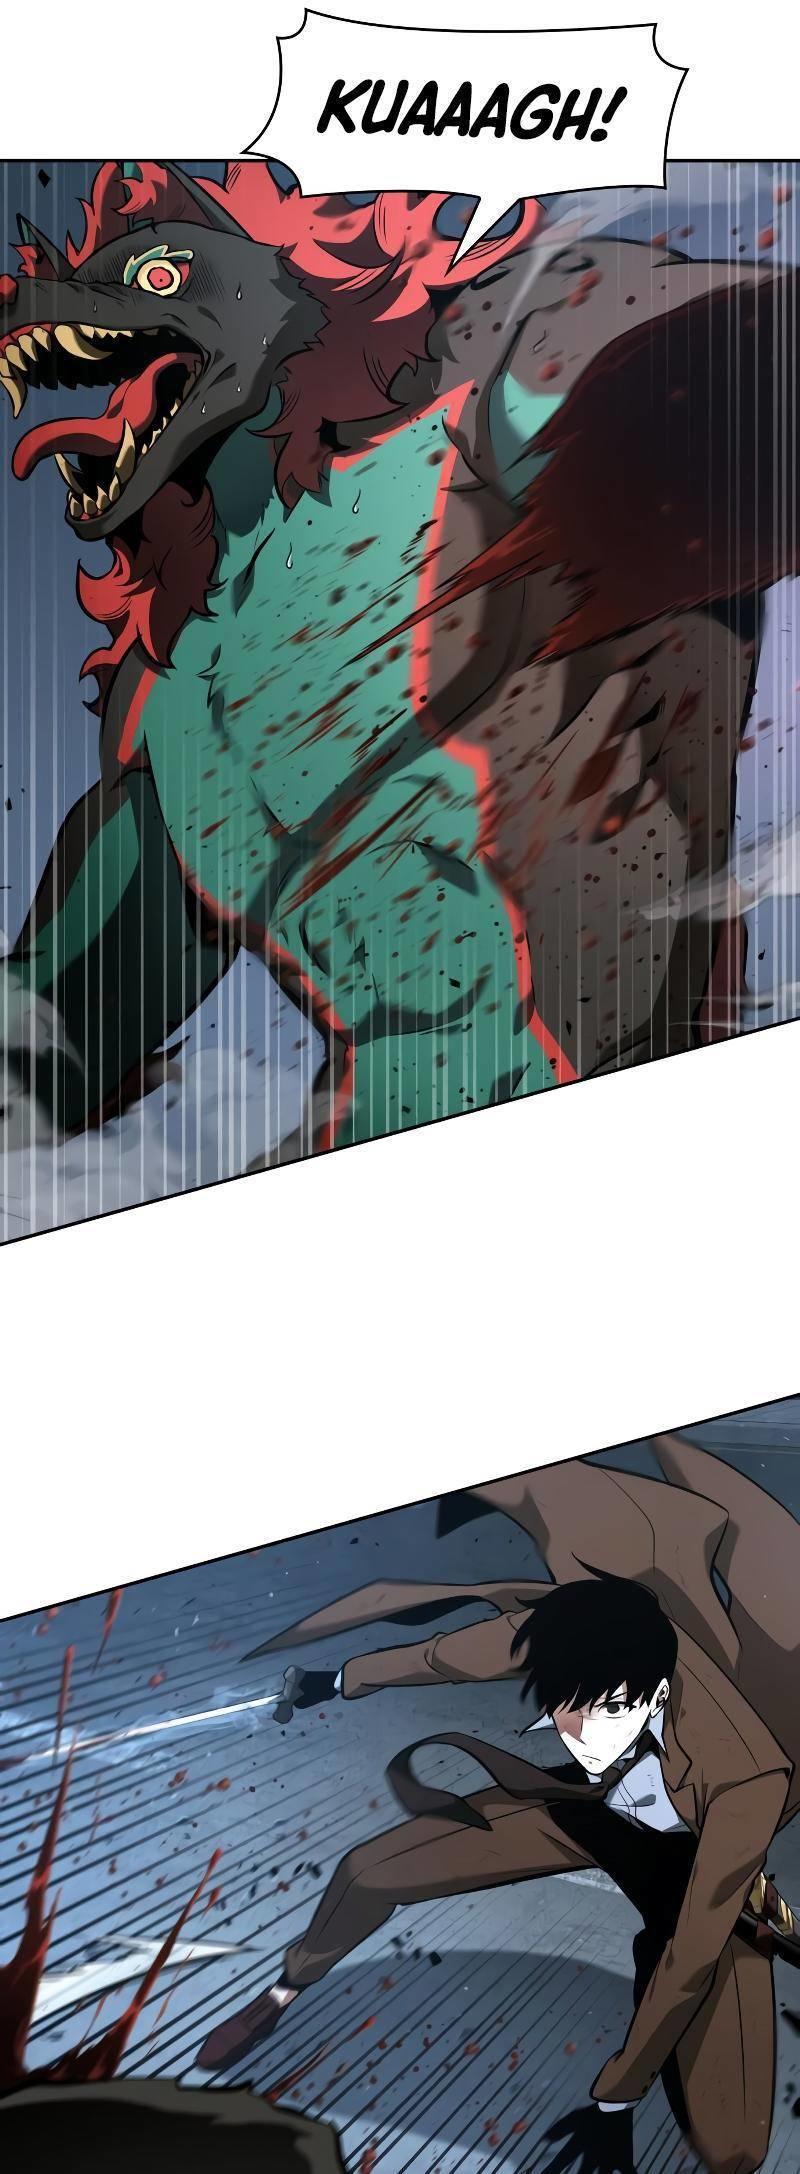 Omniscient Reader'S Viewpoint Chapter 72 page 3 - Mangakakalot